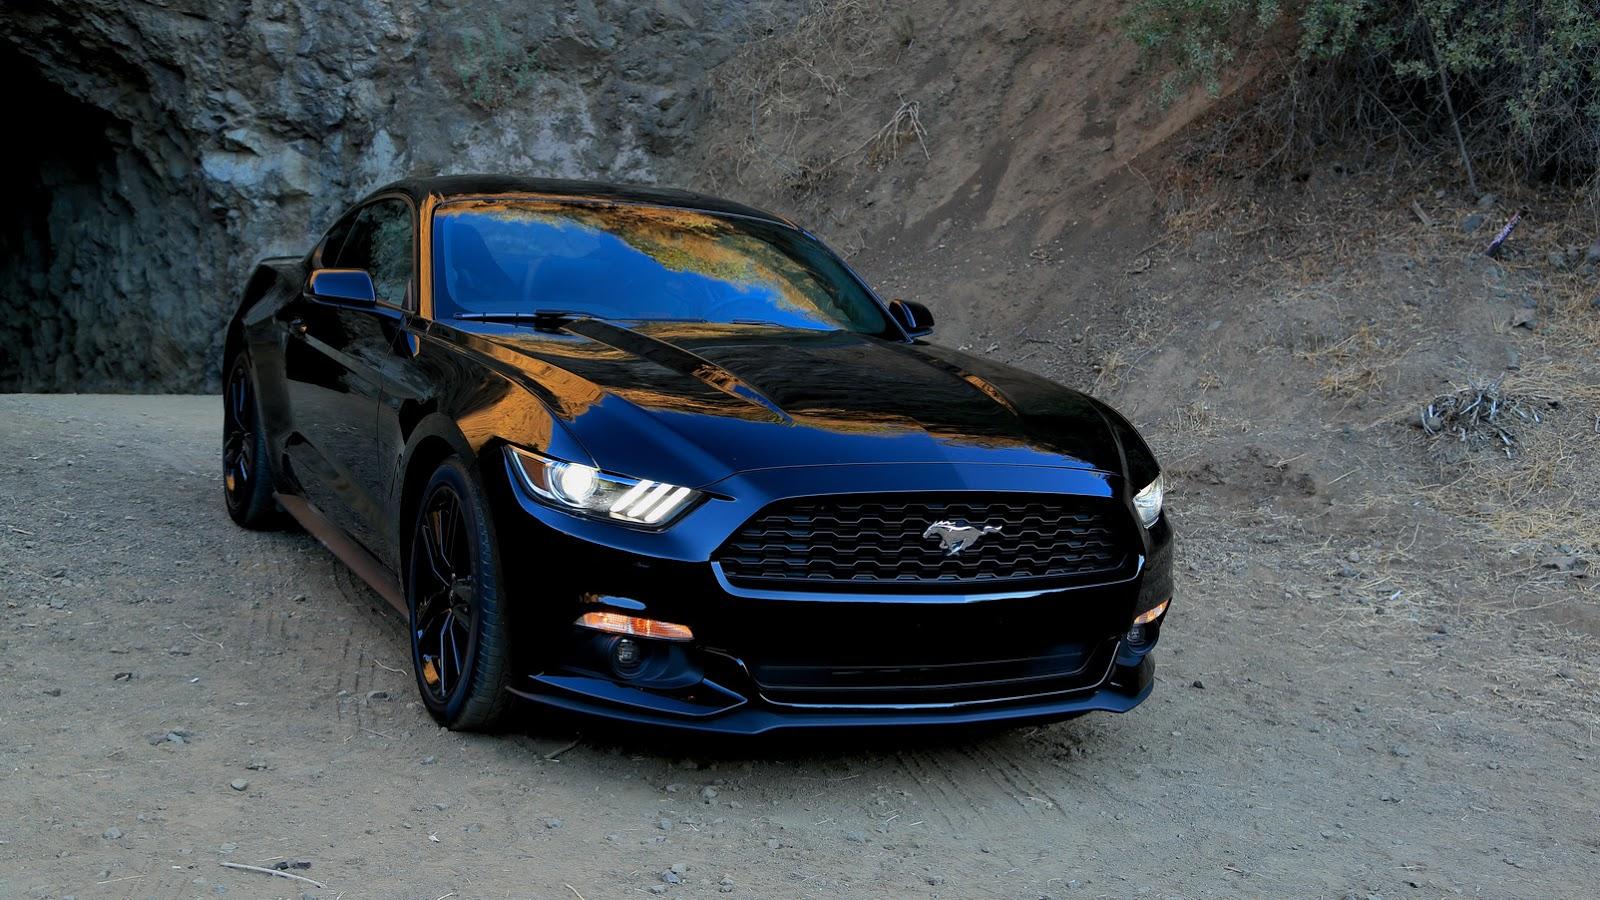 2015 ford mustang wallpaper black wallpaper 3jpg 1600x900